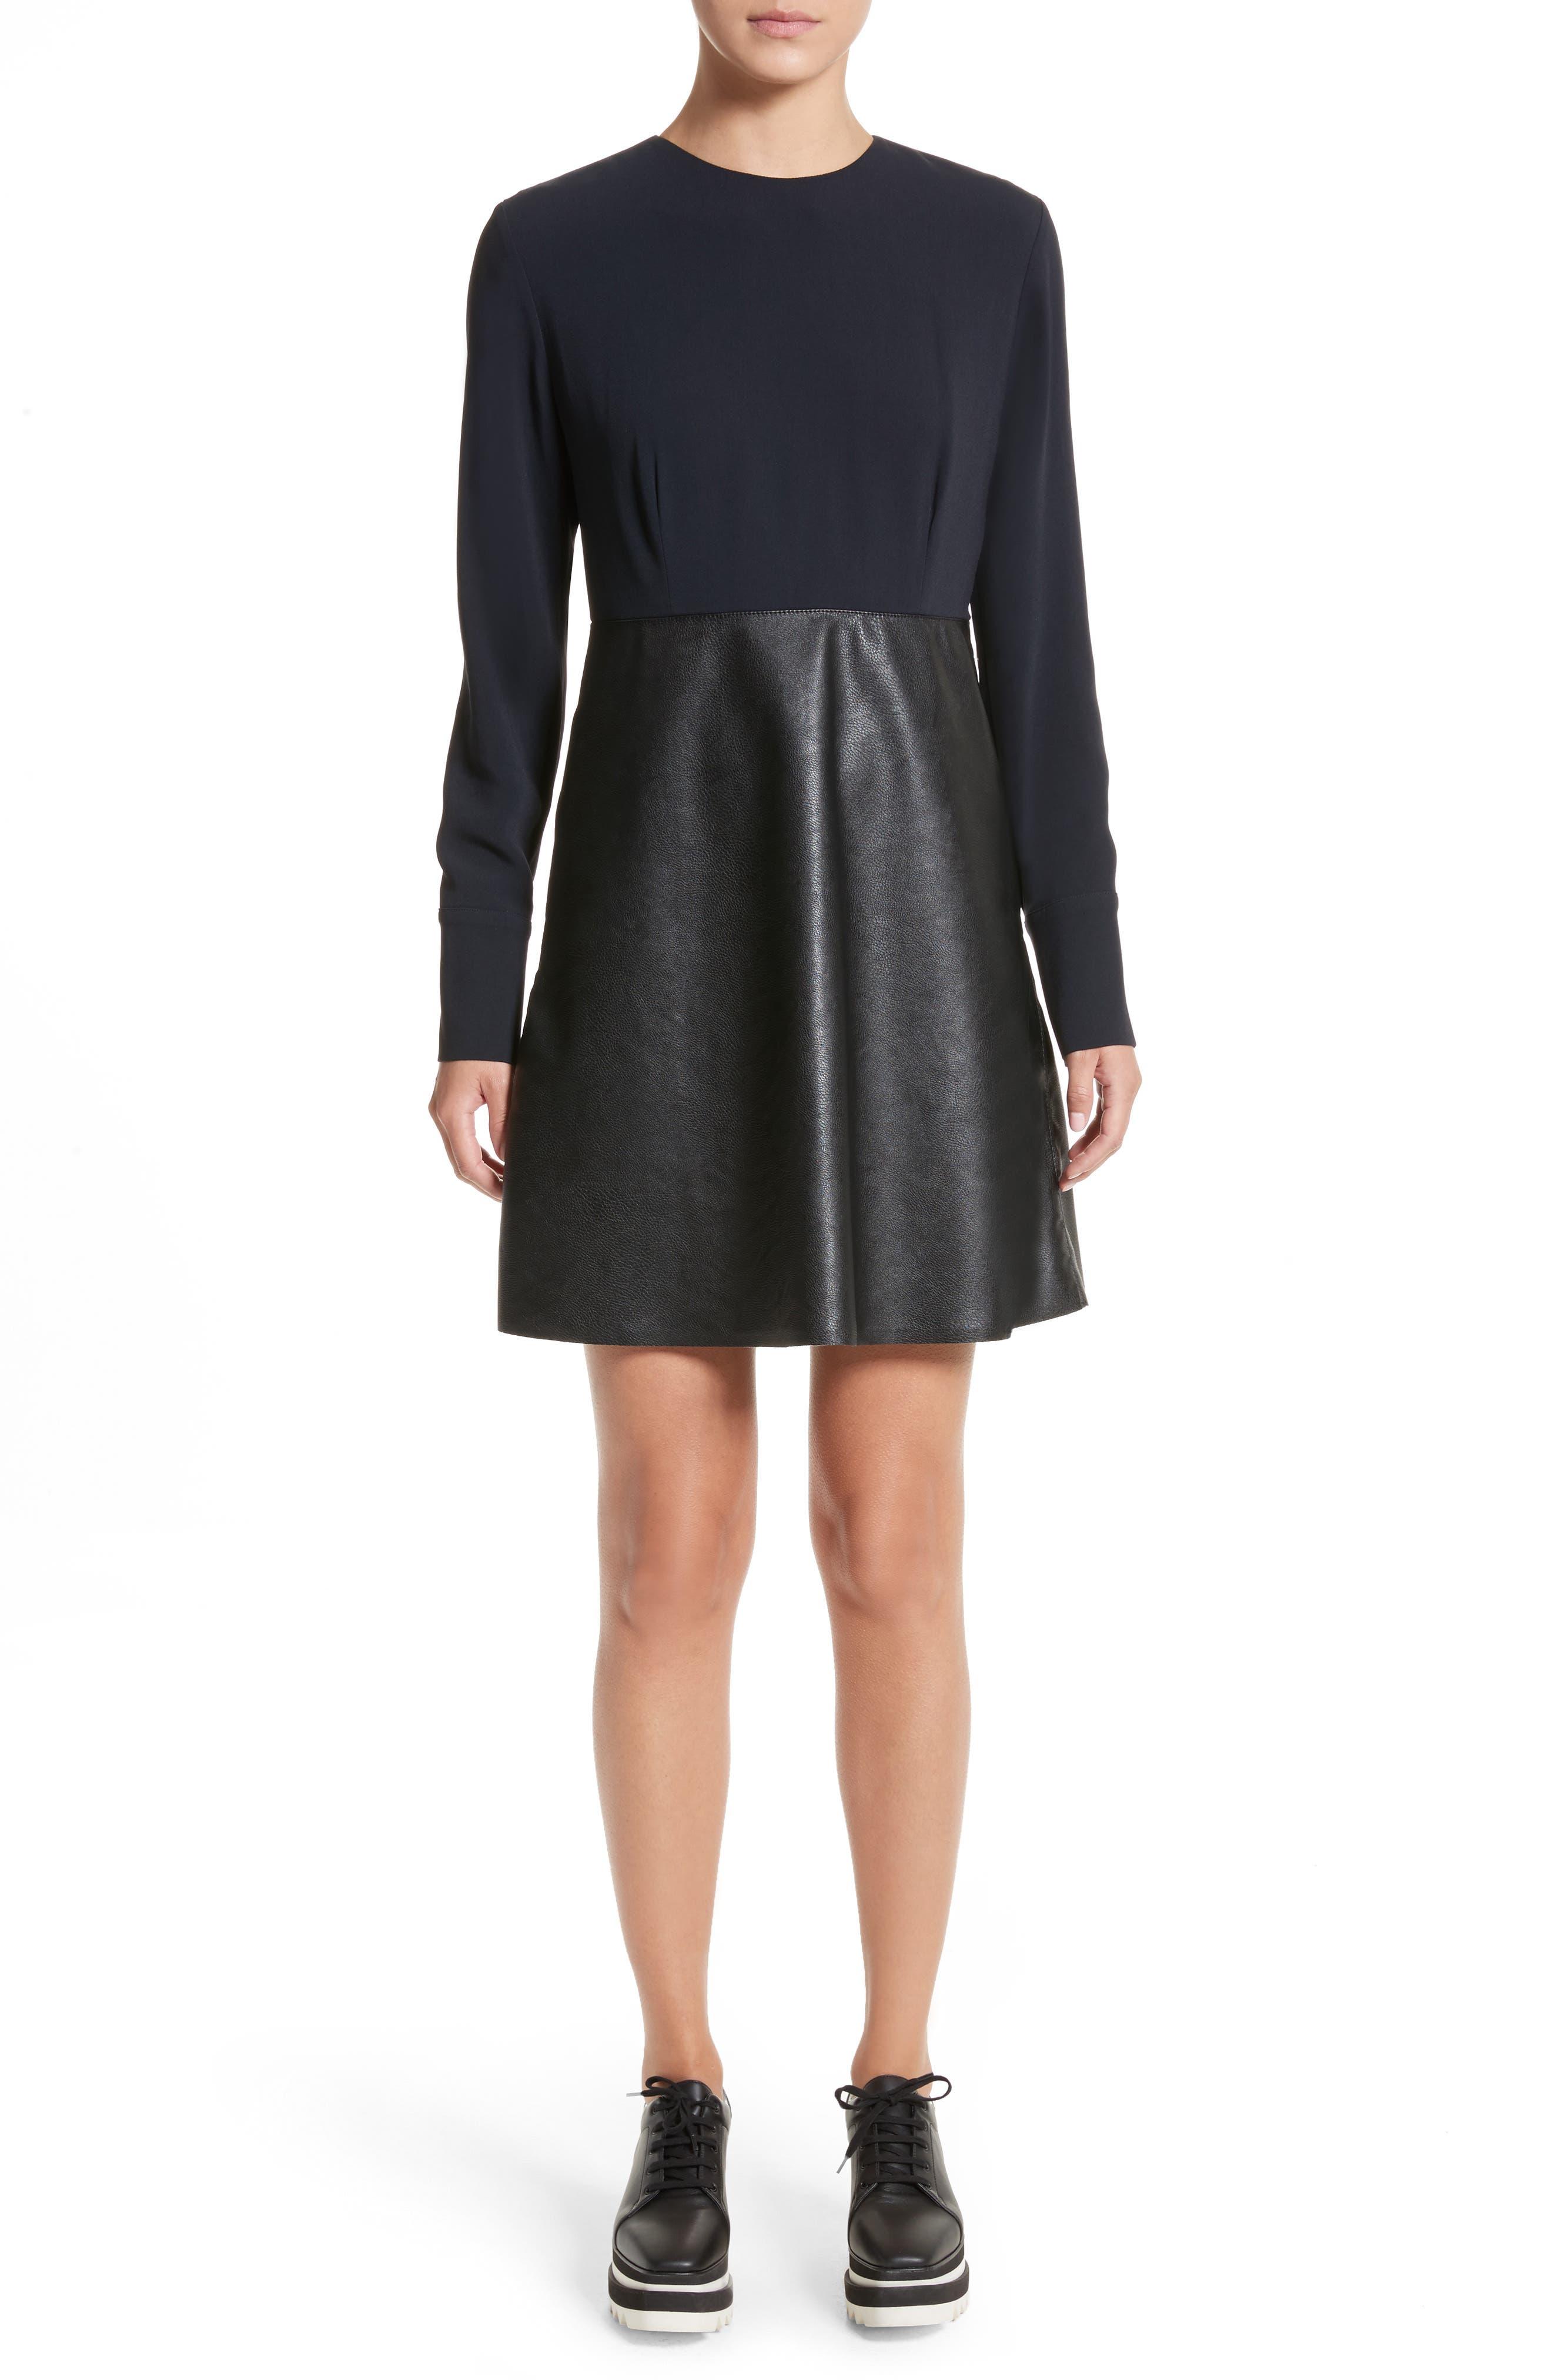 Alternate Image 1 Selected - Stella McCartney Alter Leather & Stretch Cady Dress